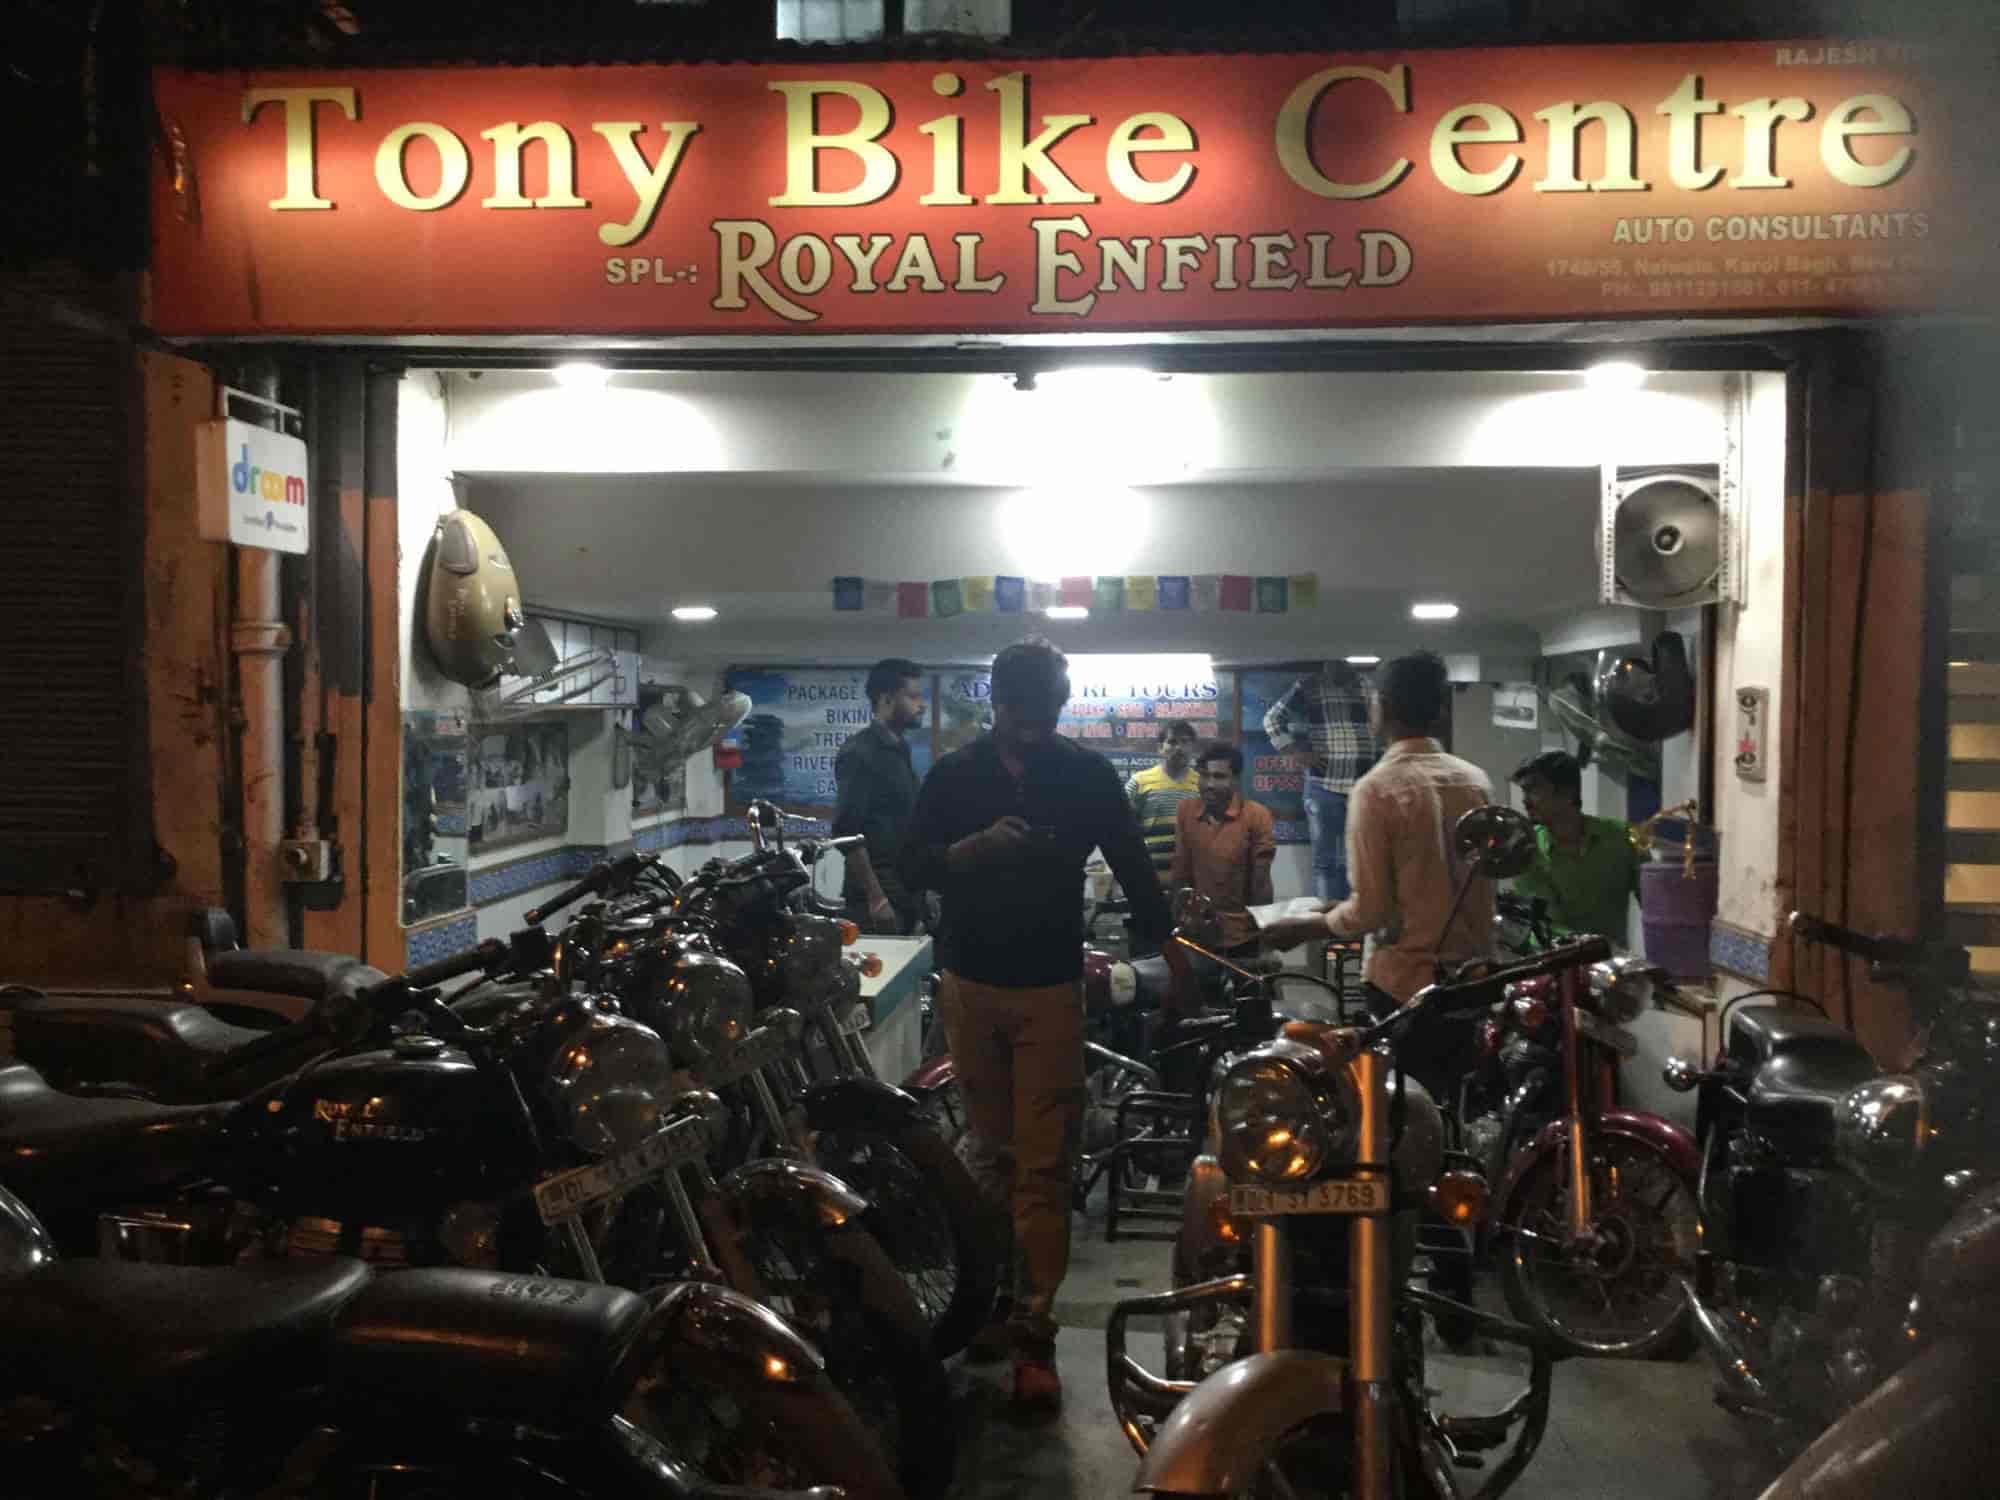 Tony Bike Centre Photos Karol Bagh Delhi Pictures Images